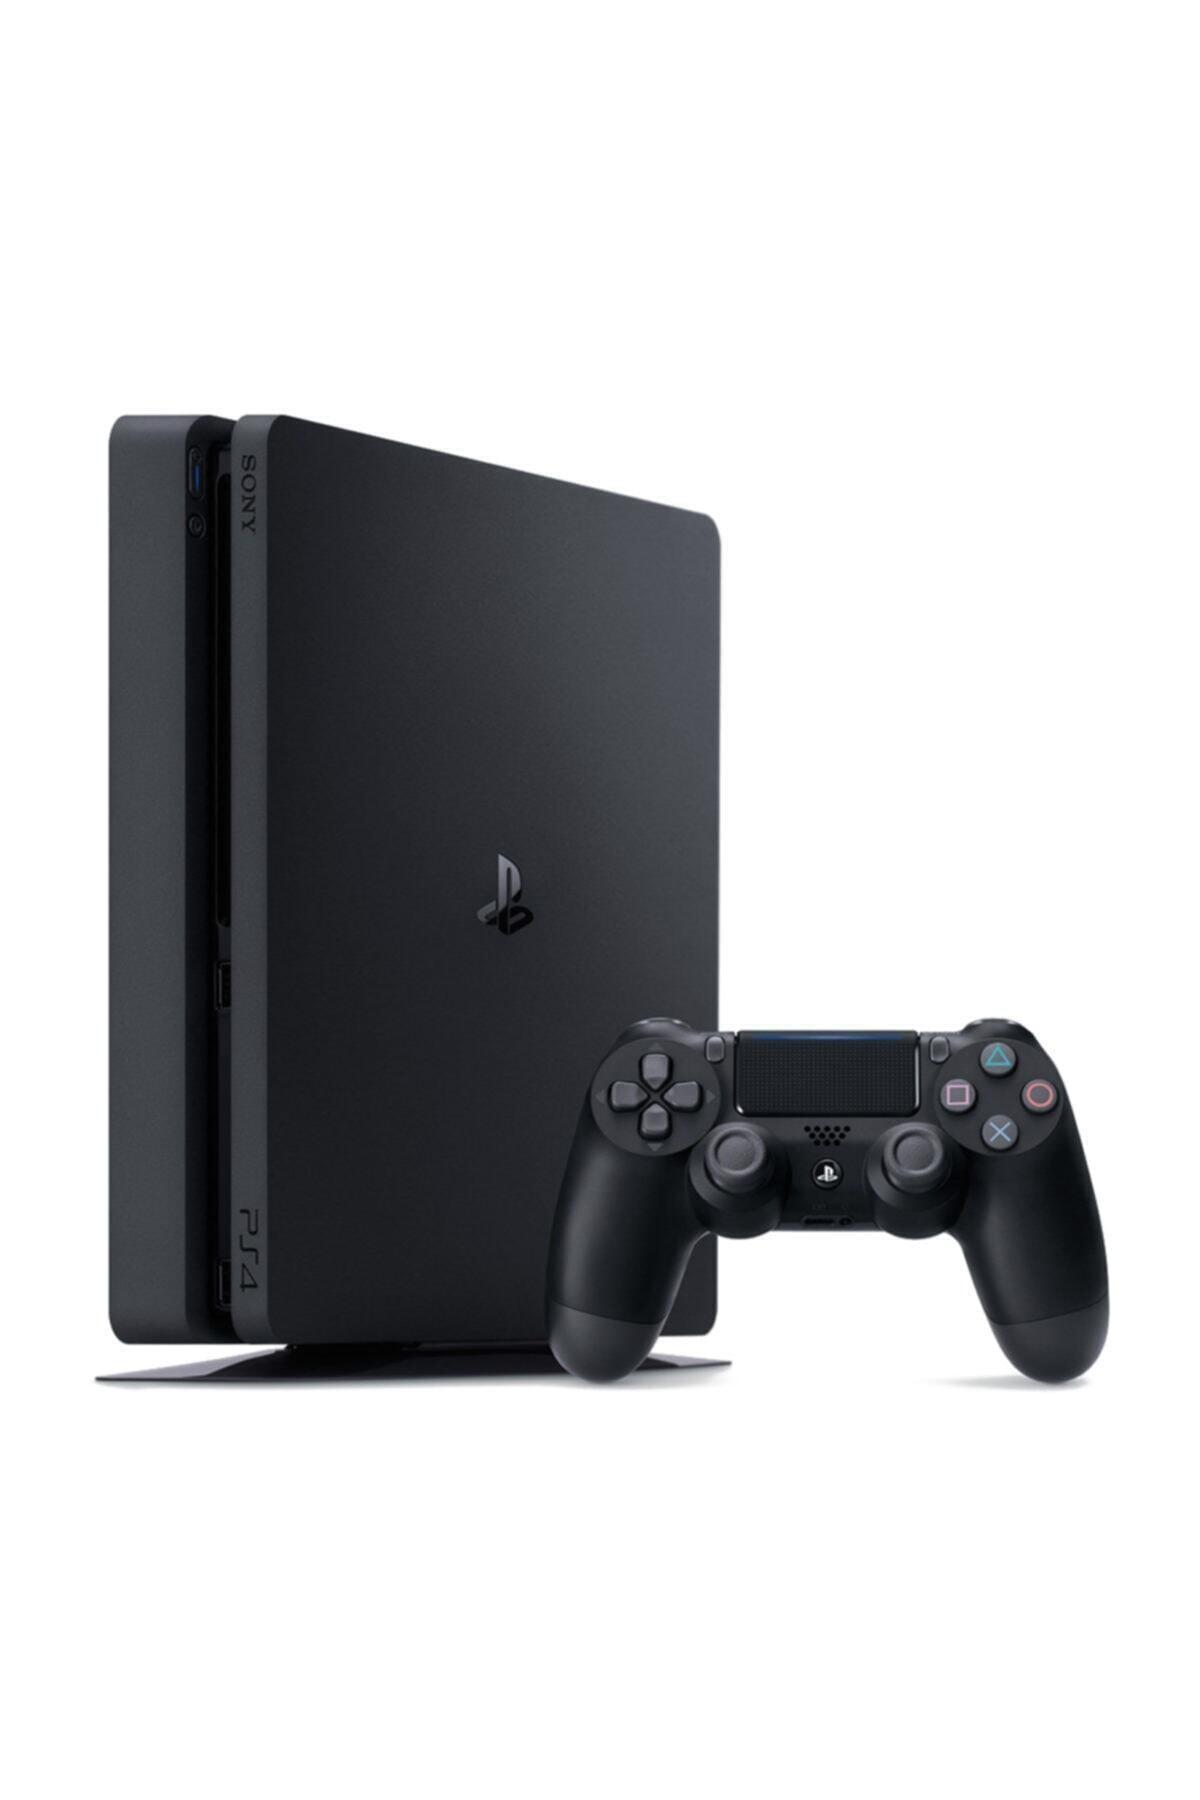 Sony Playstation 4 Slim 500 Gb - Türkçe Menü (Eurasia Garantili) 1